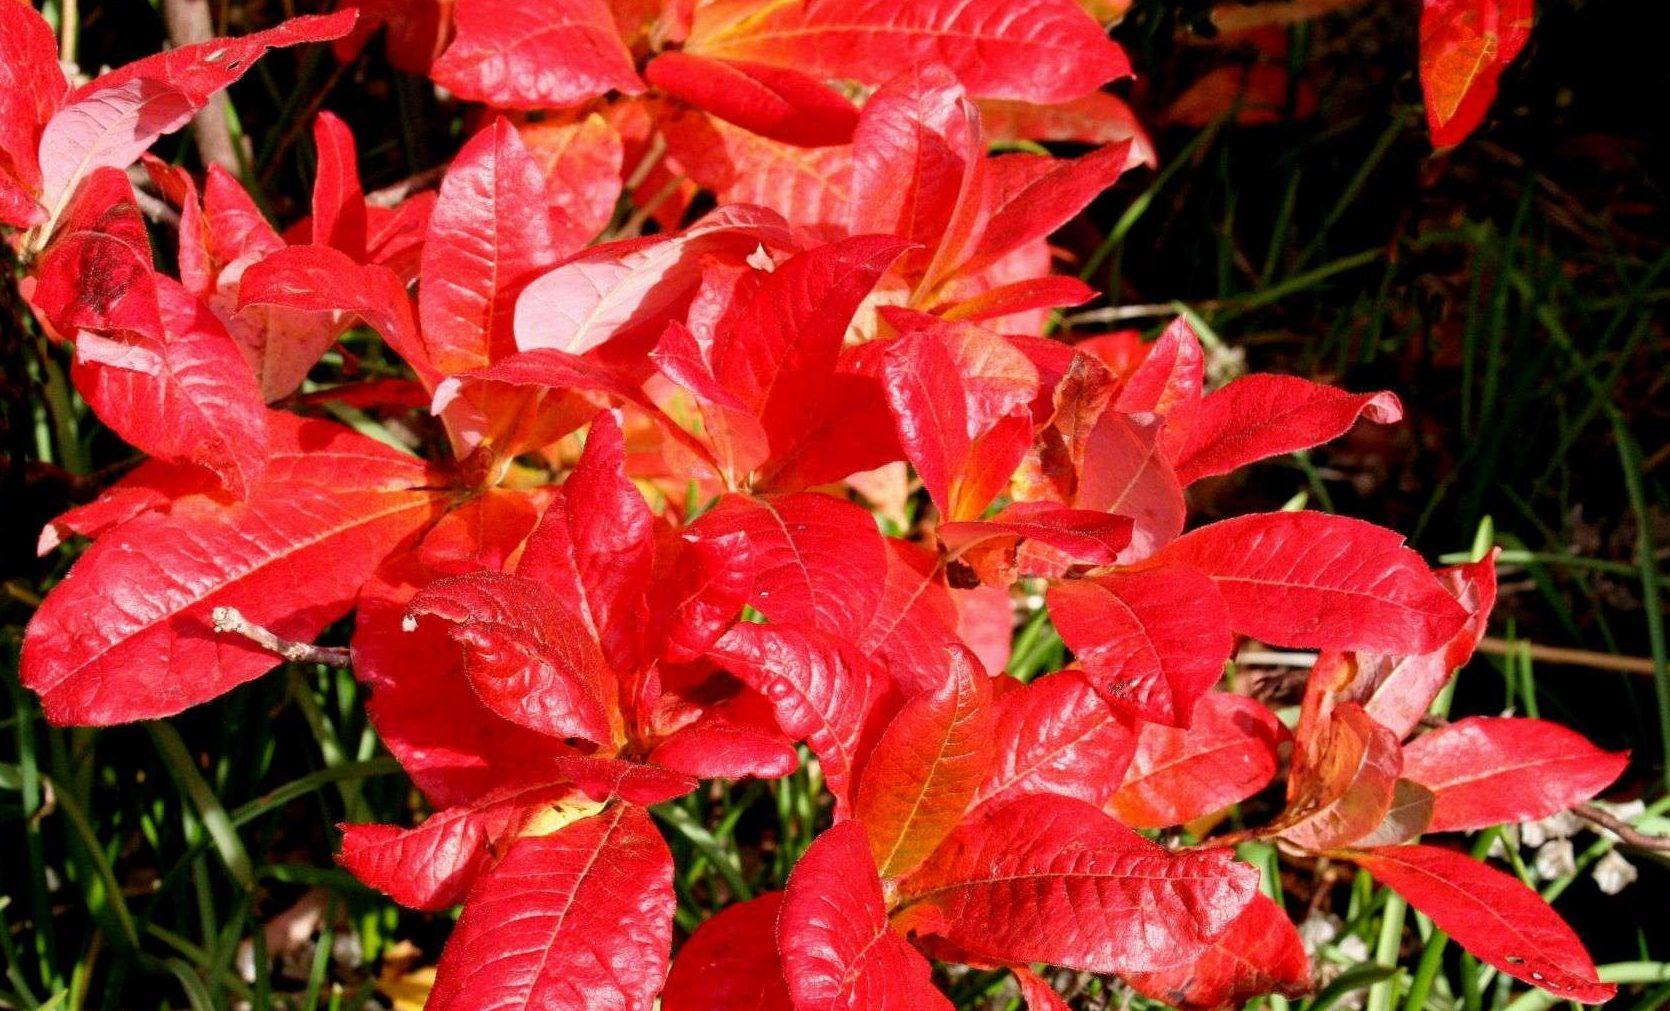 Azalea in autumn but toxic by nature